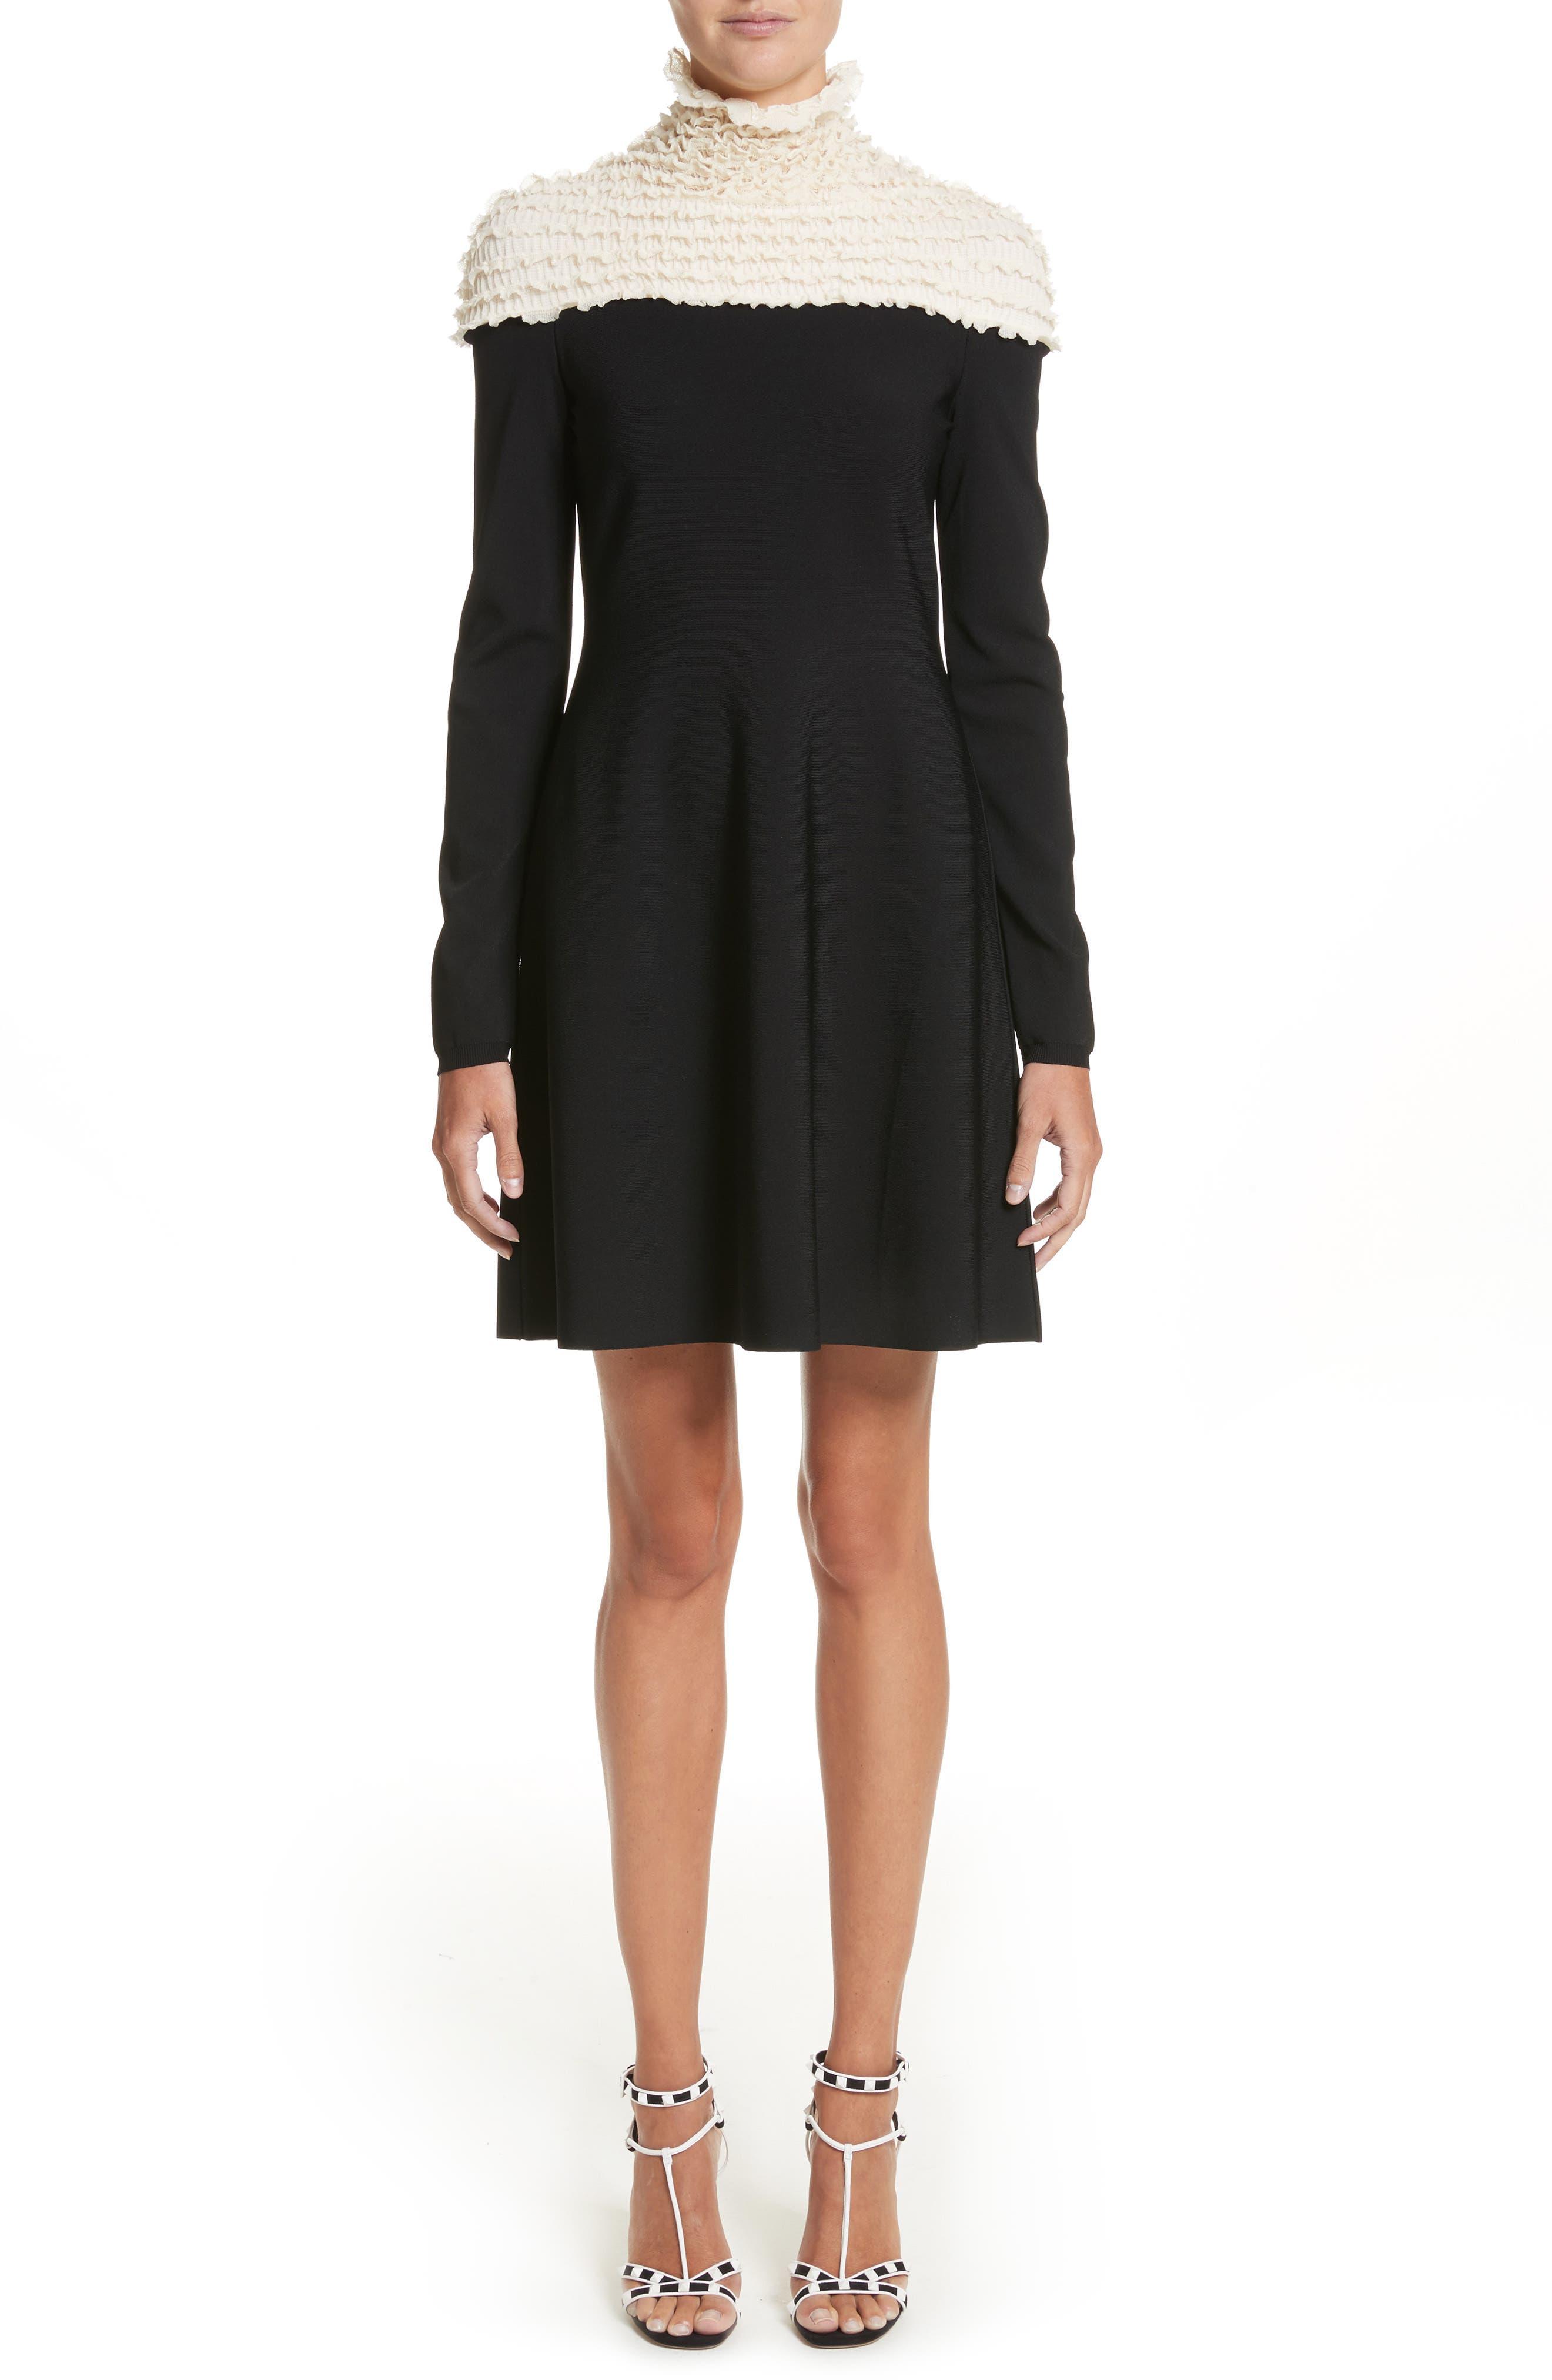 Ruffle Neckline Knit Dress,                         Main,                         color, Black/ Ivory